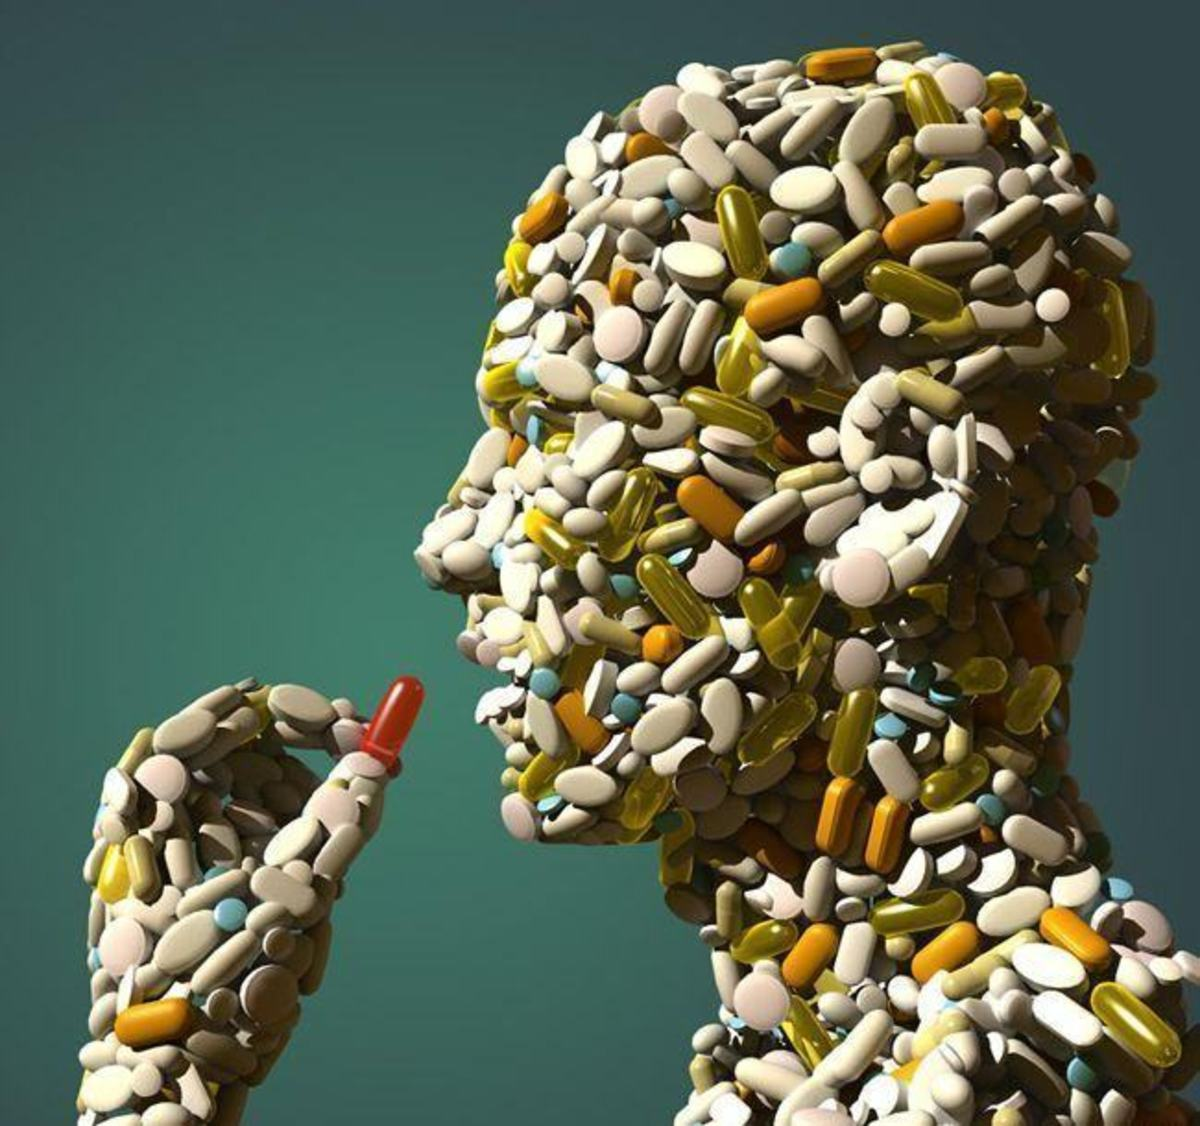 sociology-of-medicine-deviance-and-medicalization